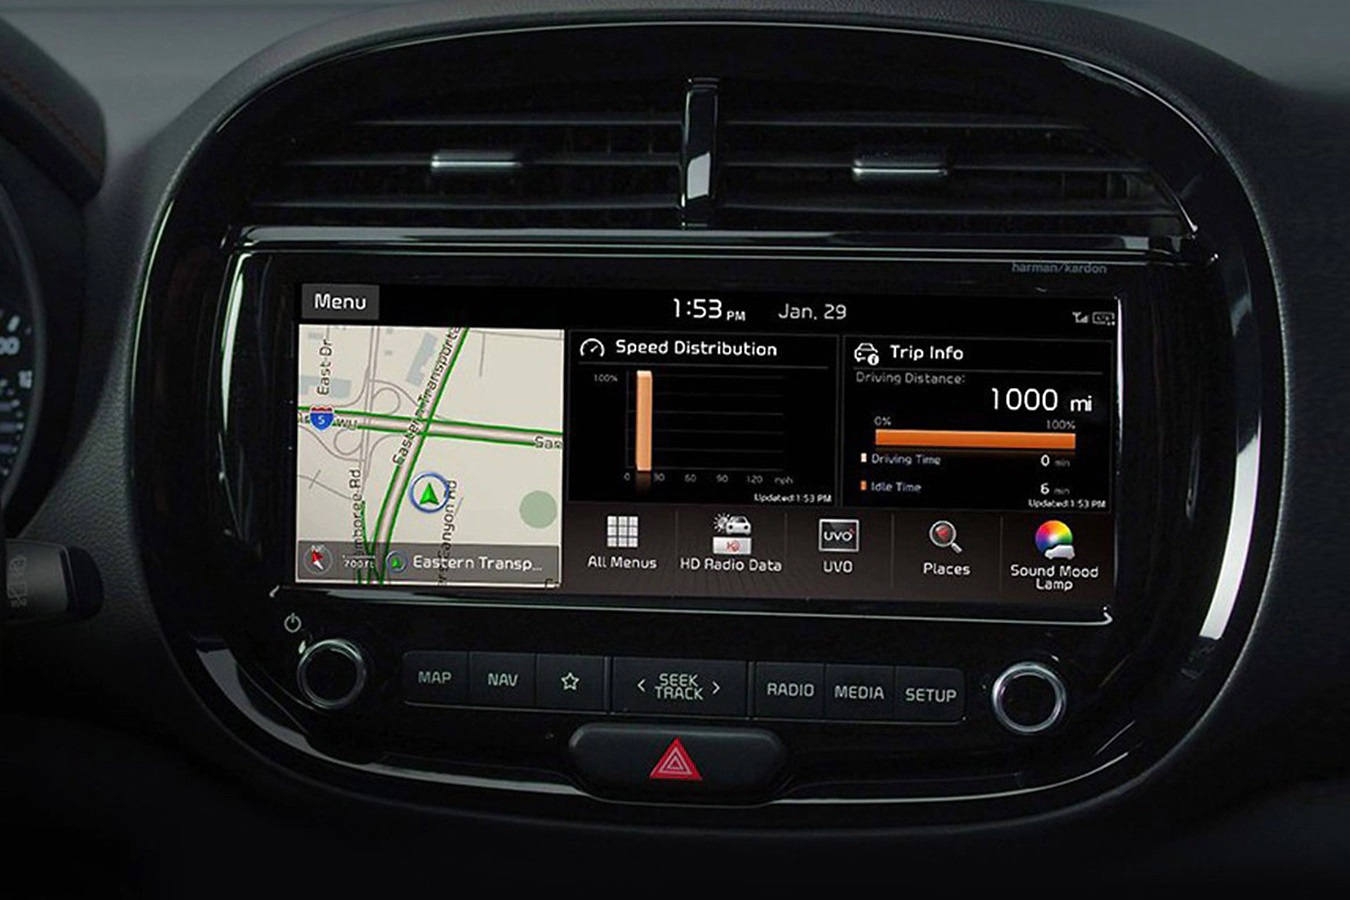 2020 Kia Soul Touchscreen Display